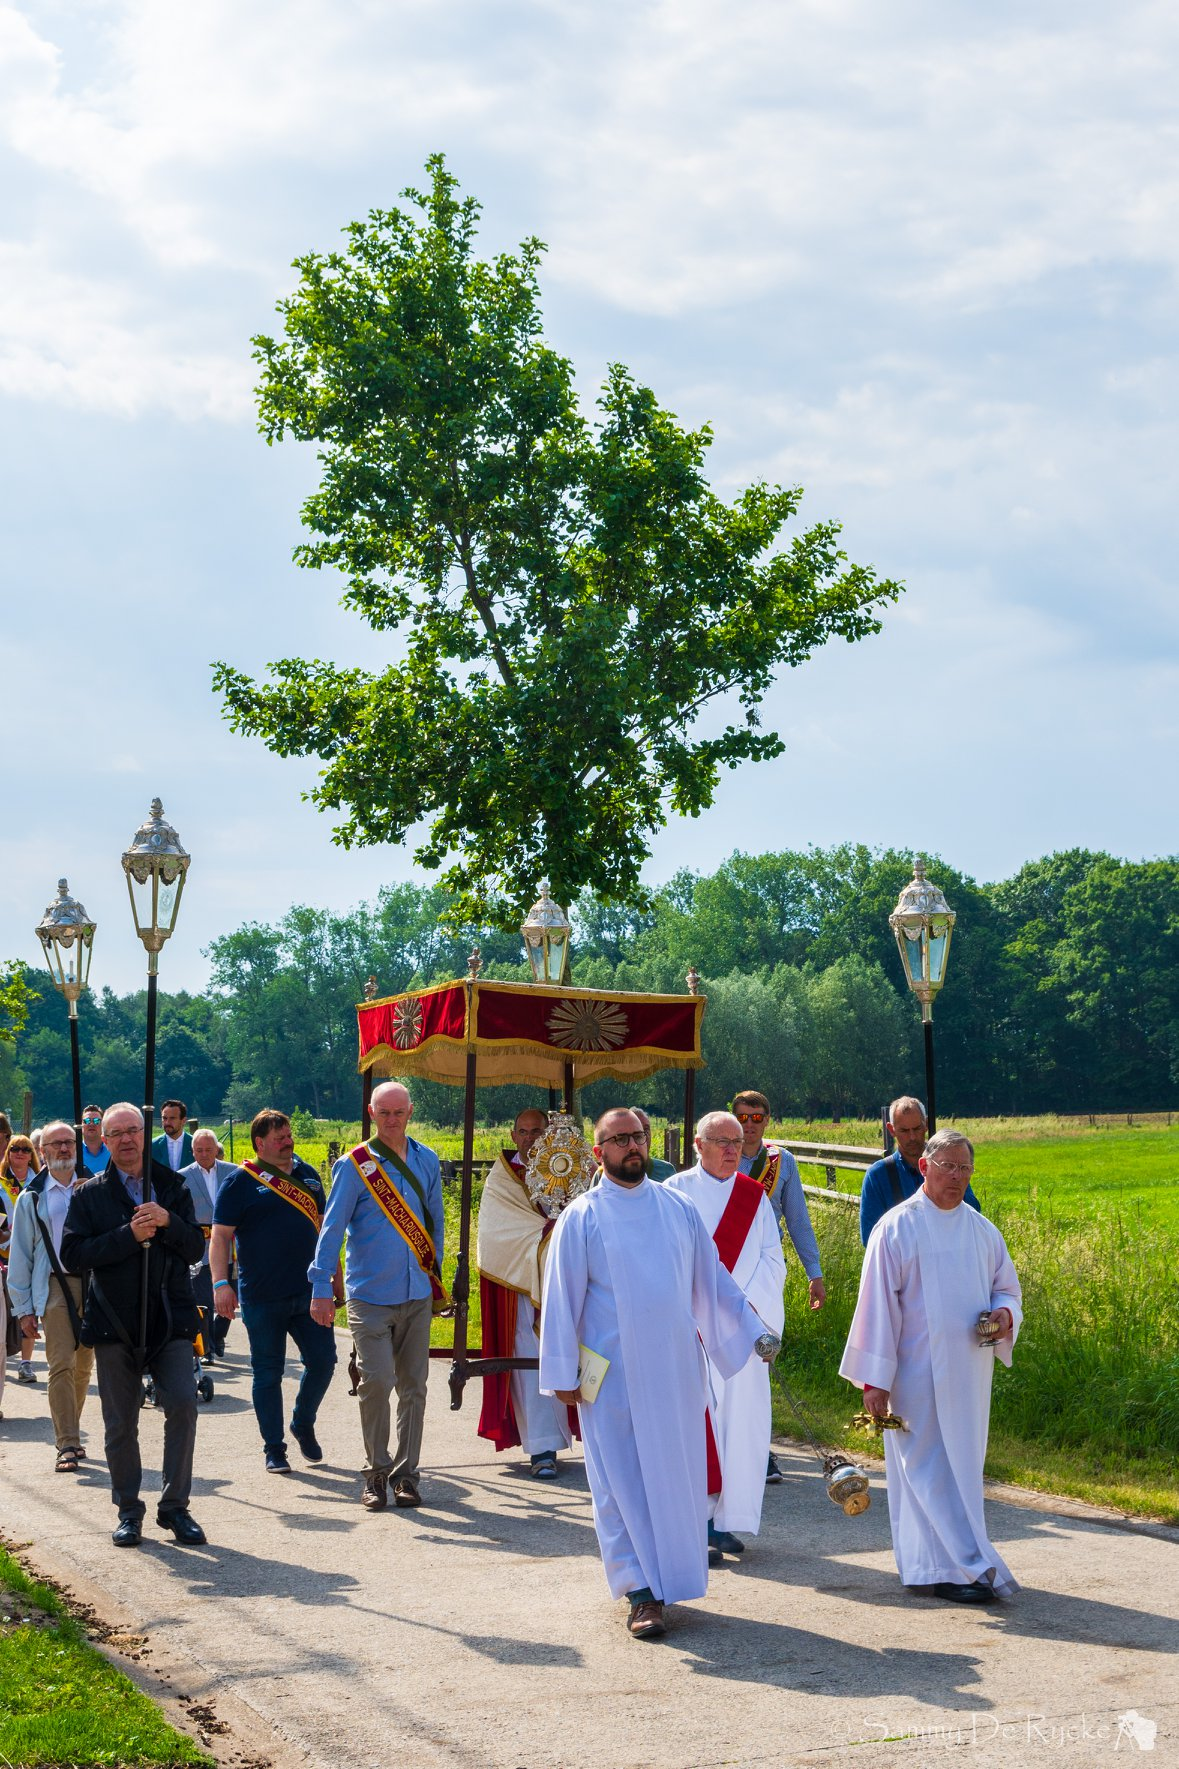 Sacramentsprocessie © Sammy De Rycke (UrbexS)